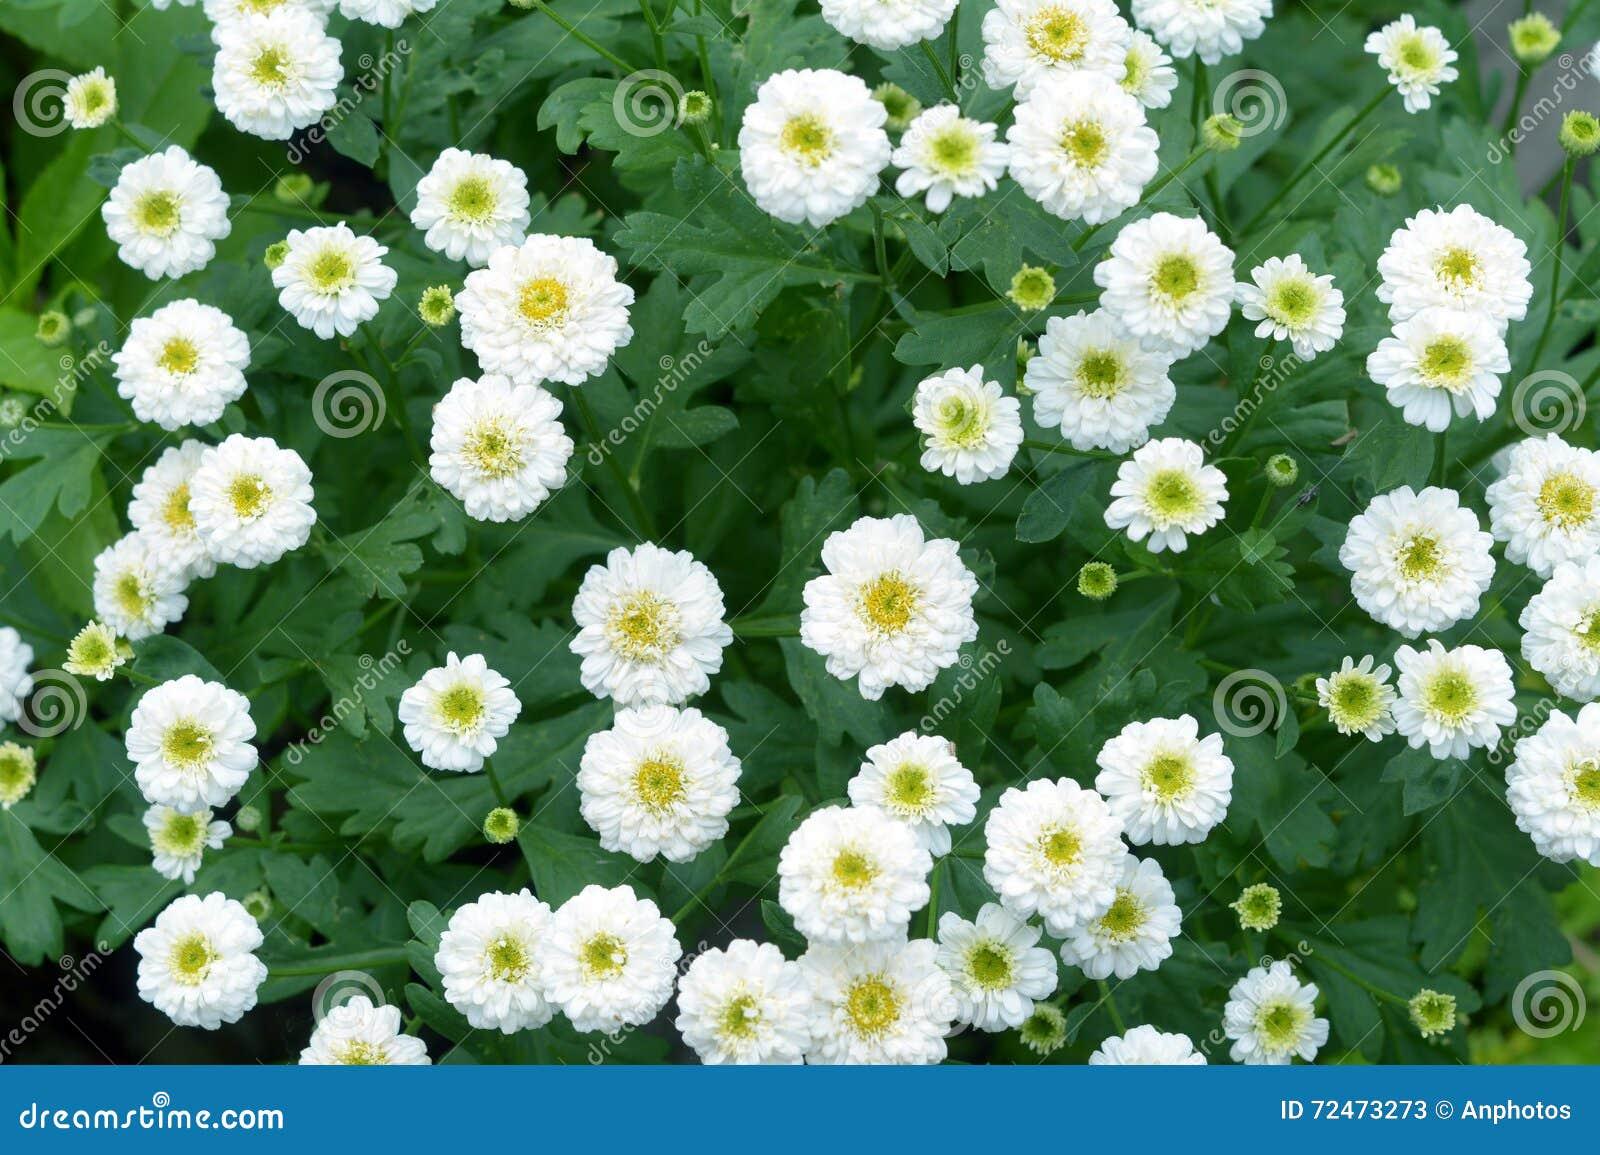 White Mum Flower Stock Image Image Of Beauty Petal 72473273